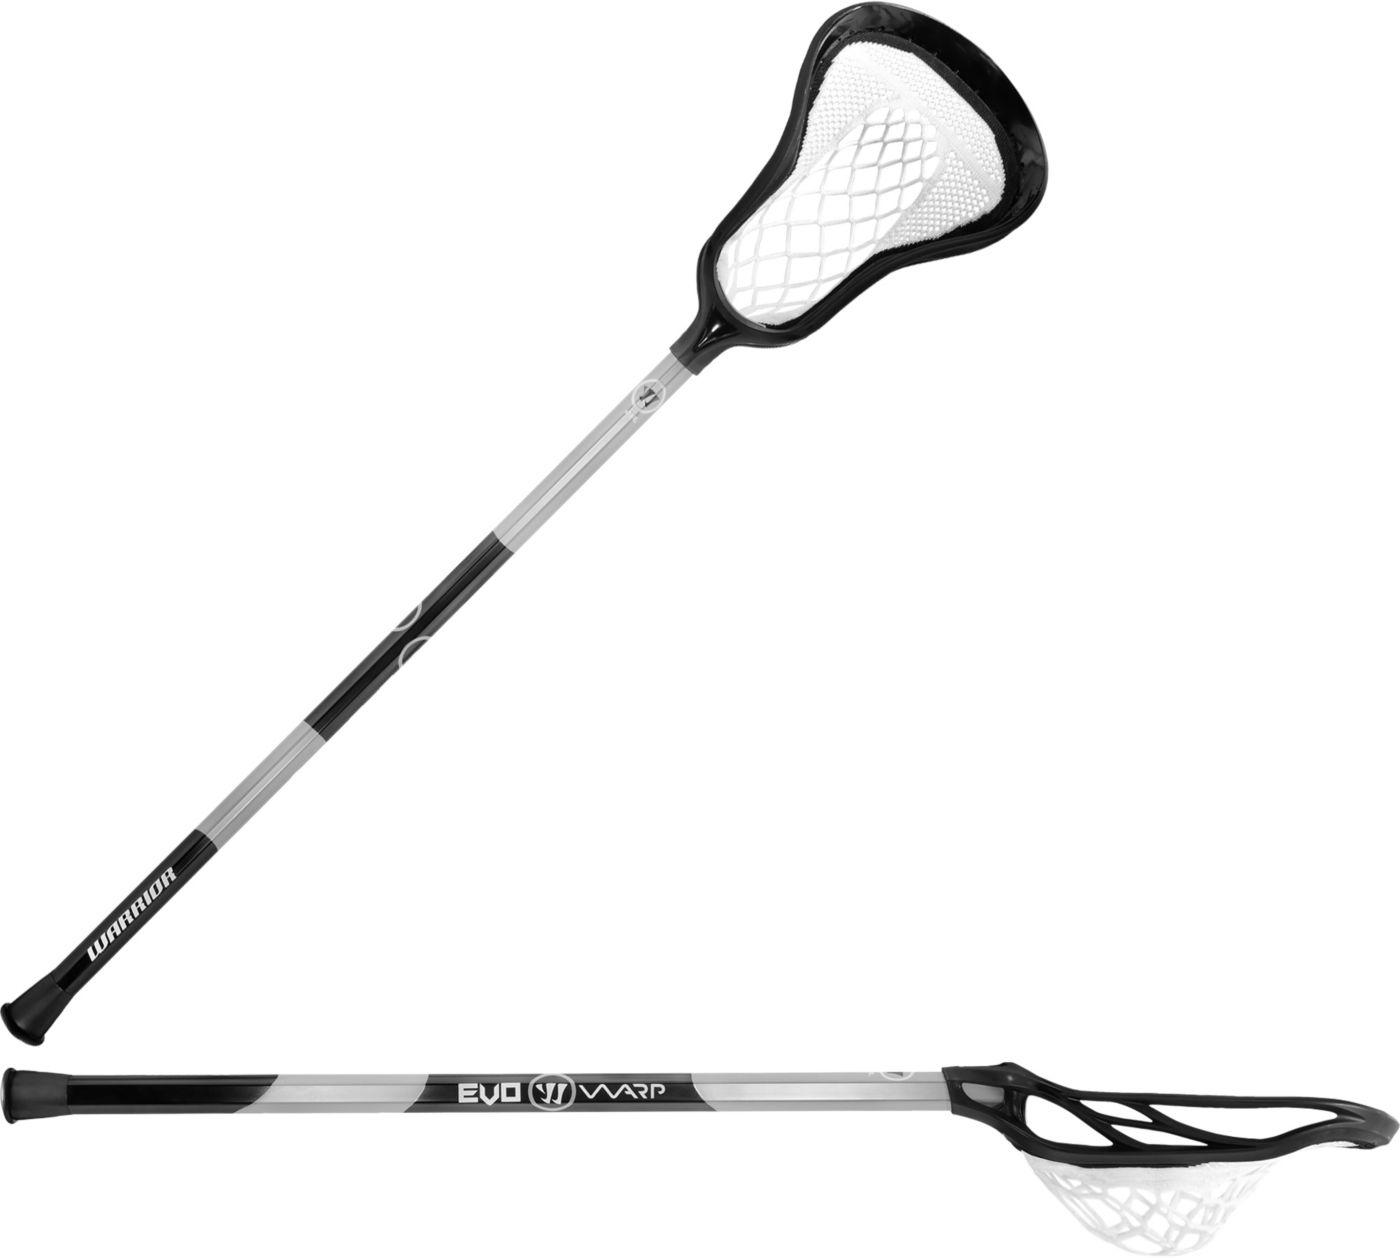 Warrior Evo Warp Junior 37'' Complete Attack Lacrosse Stick